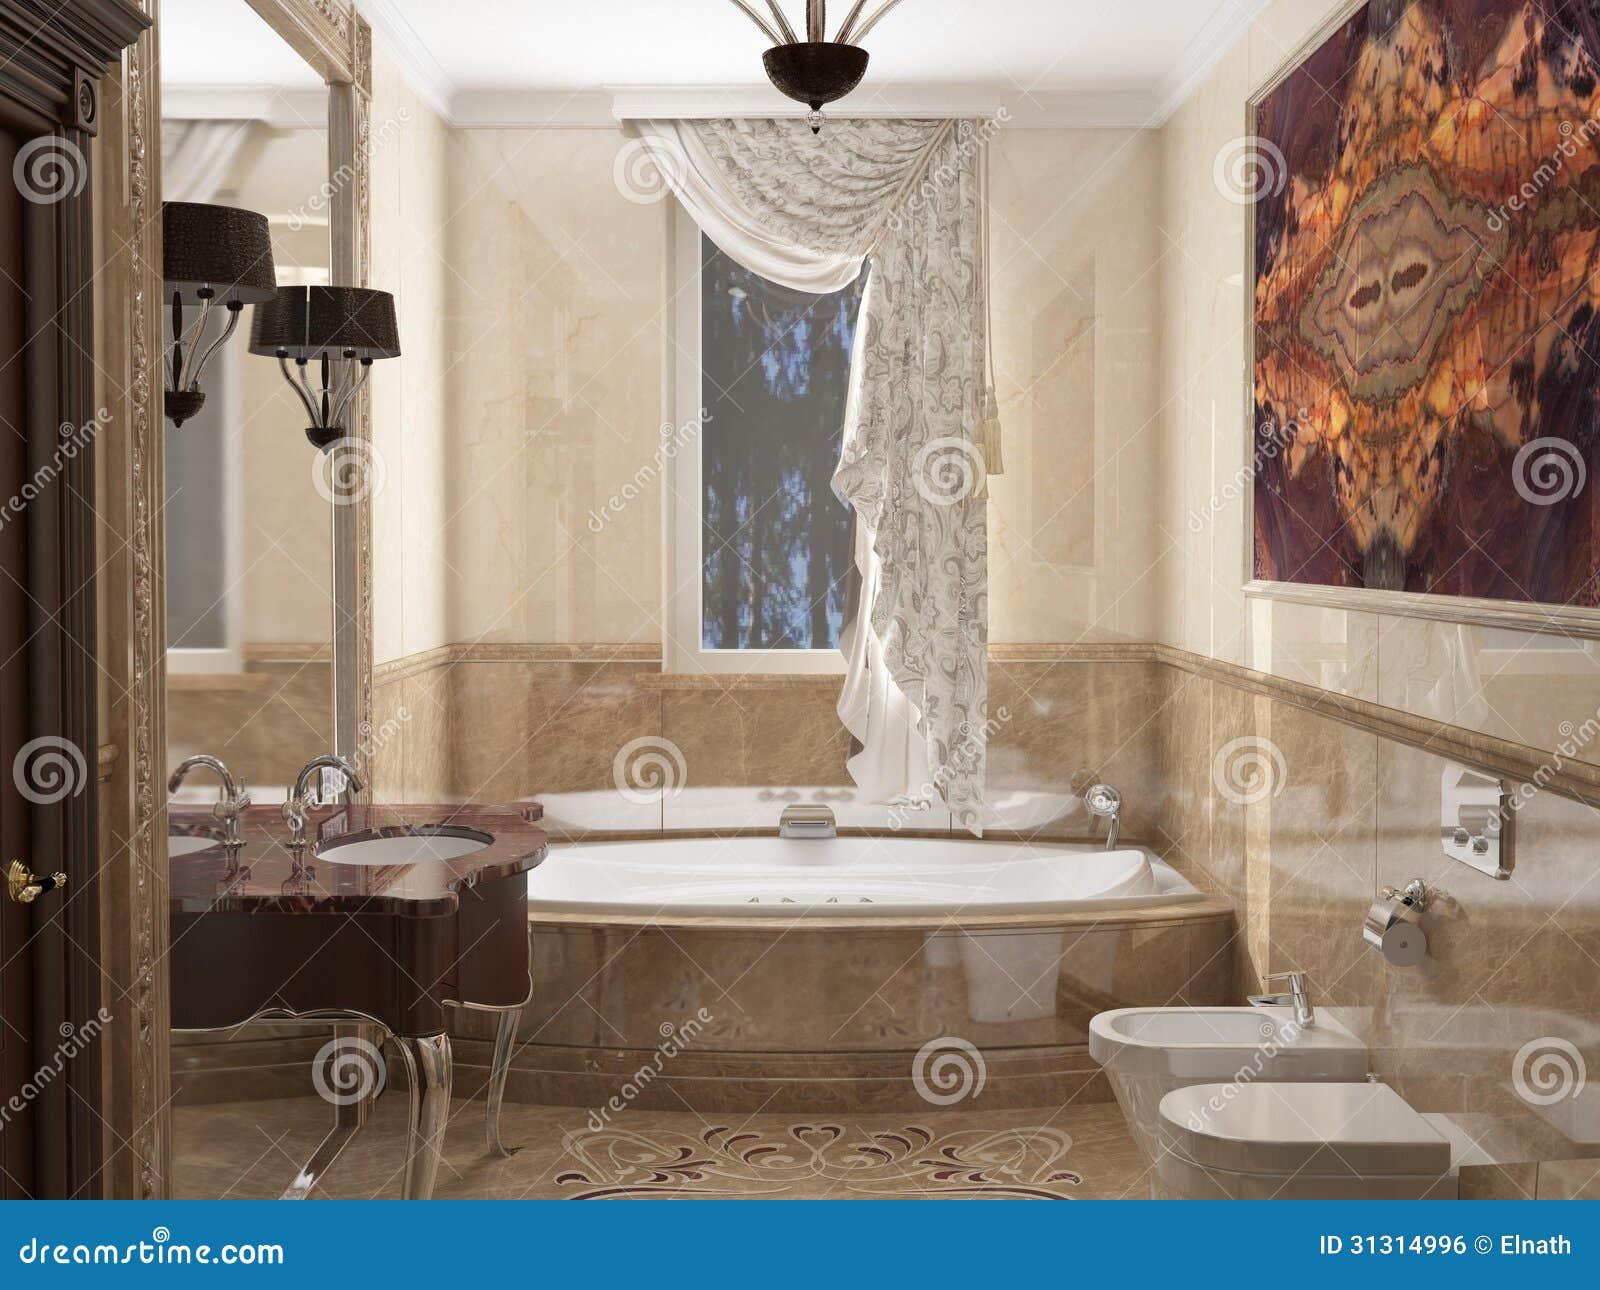 Major Interior Design Styles